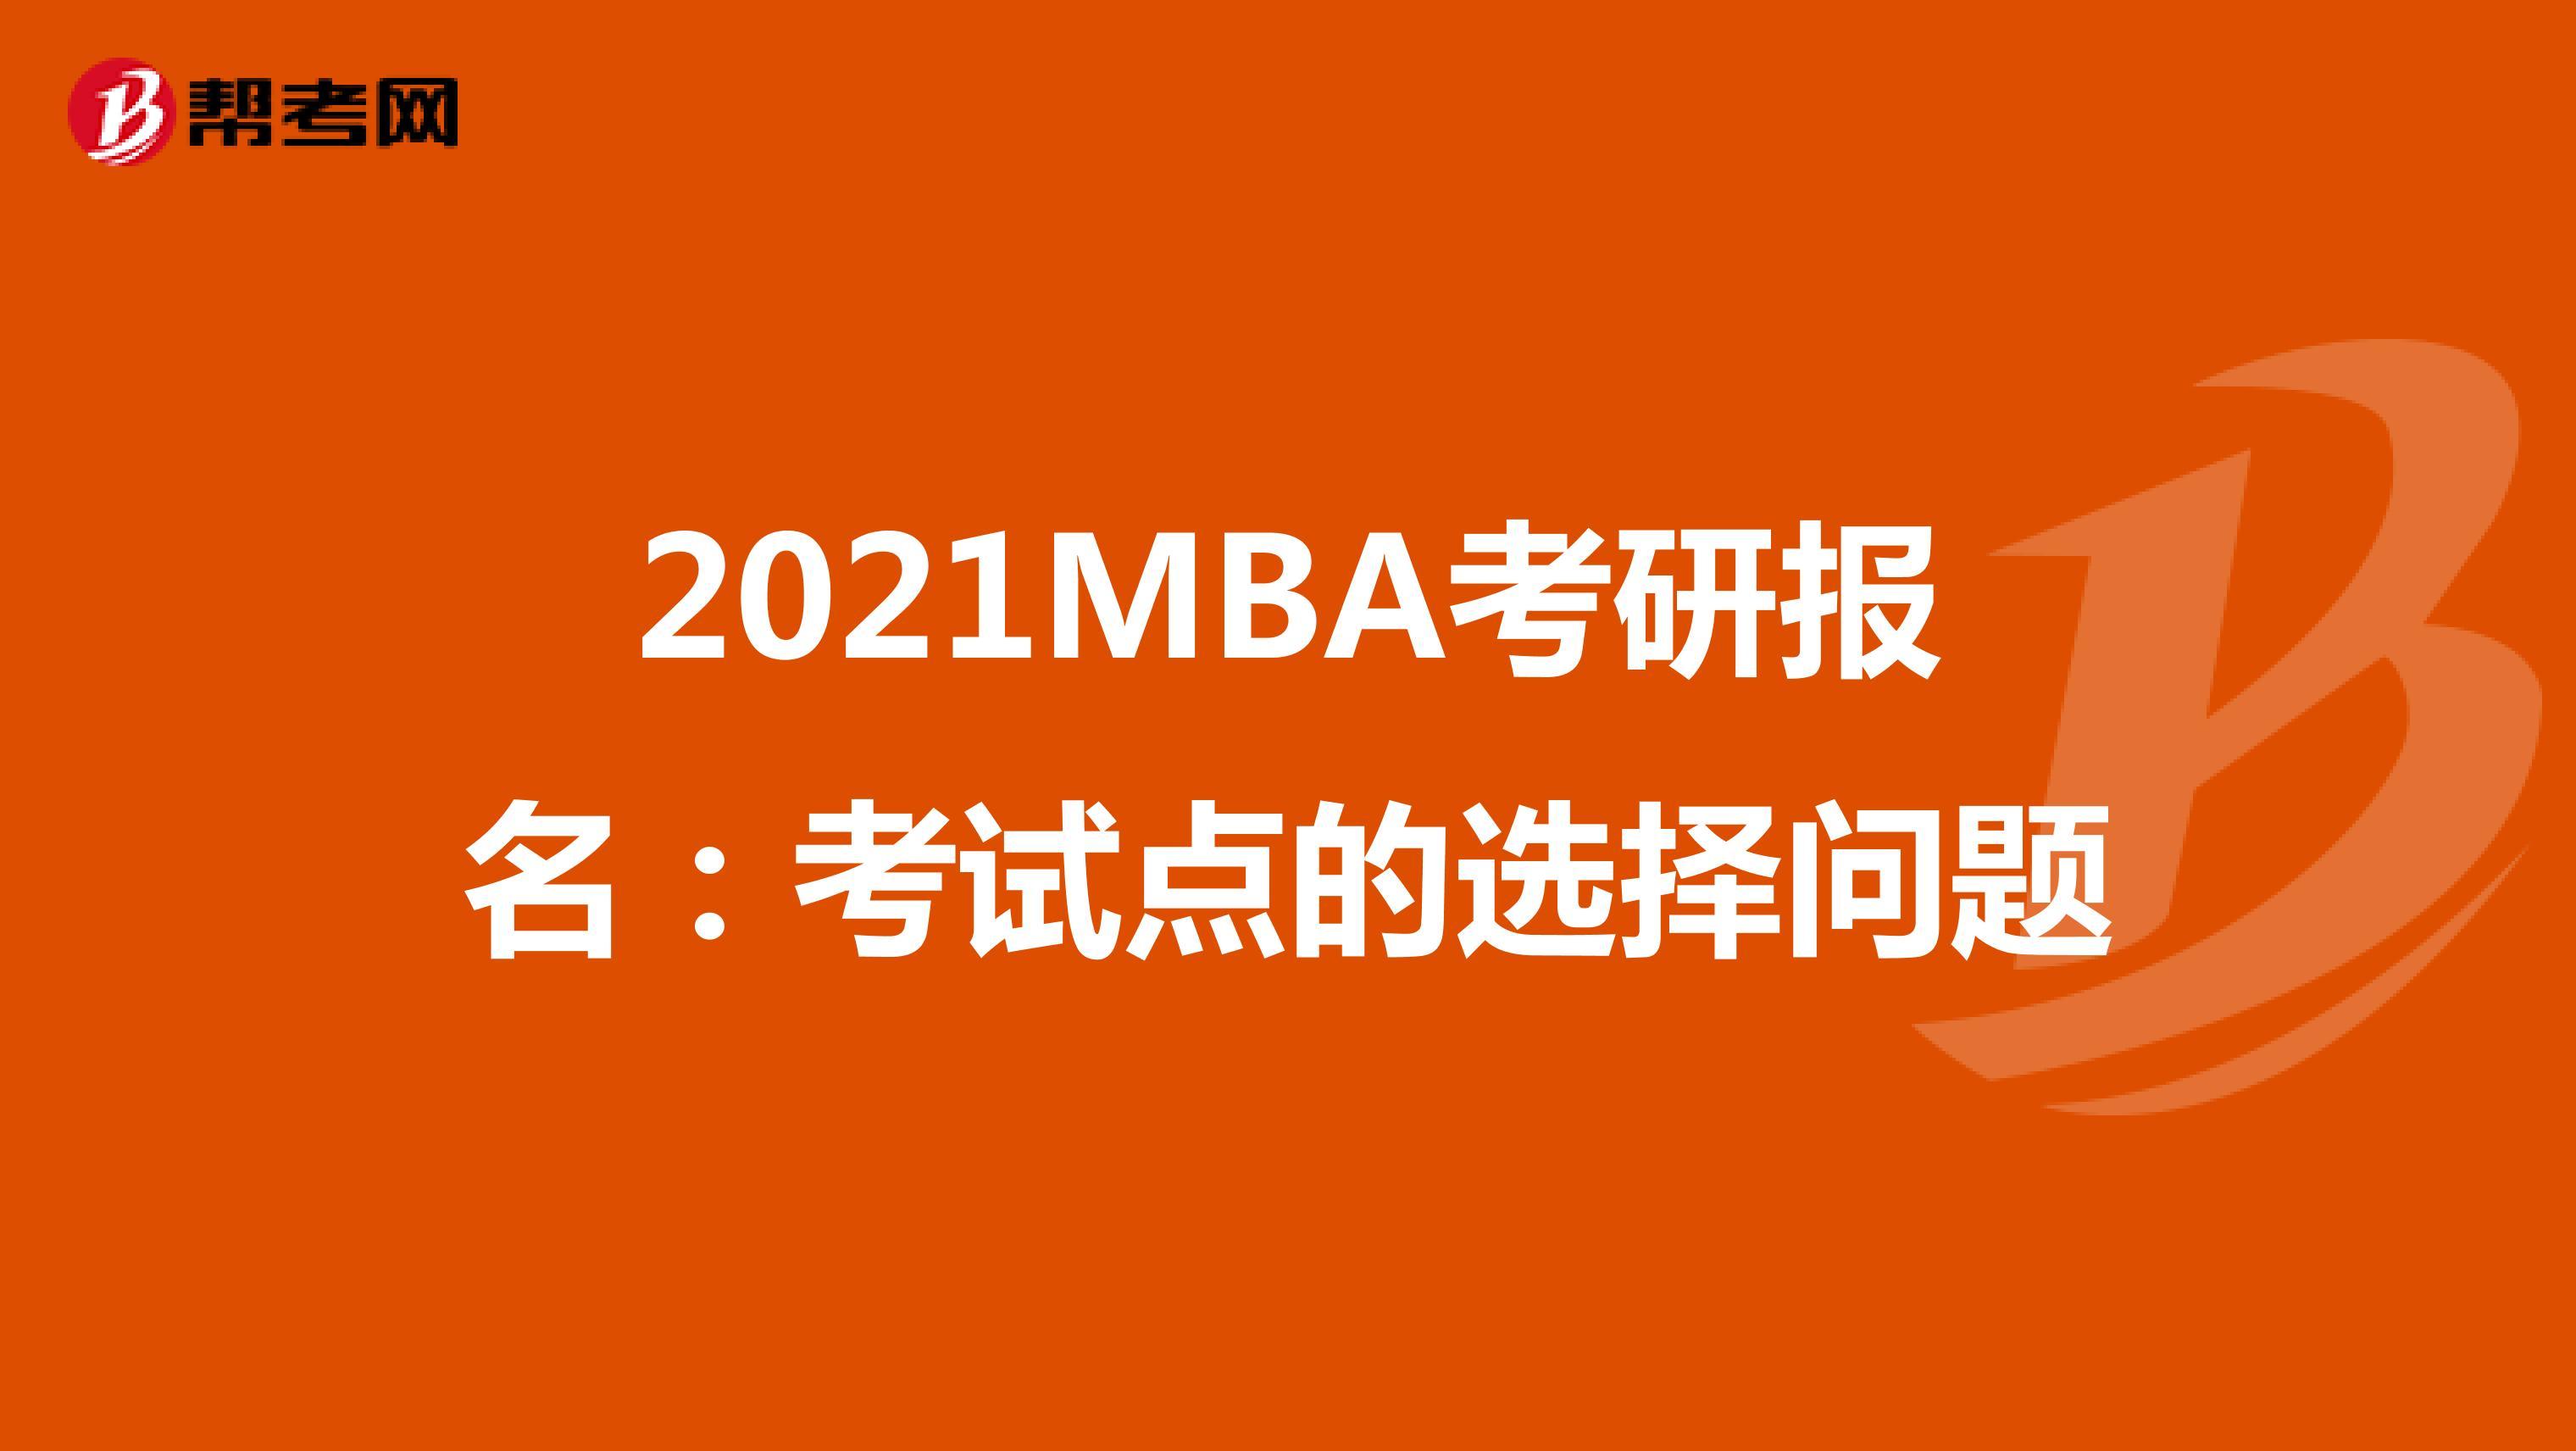 2021MBA考研报名:考试点的选择问题